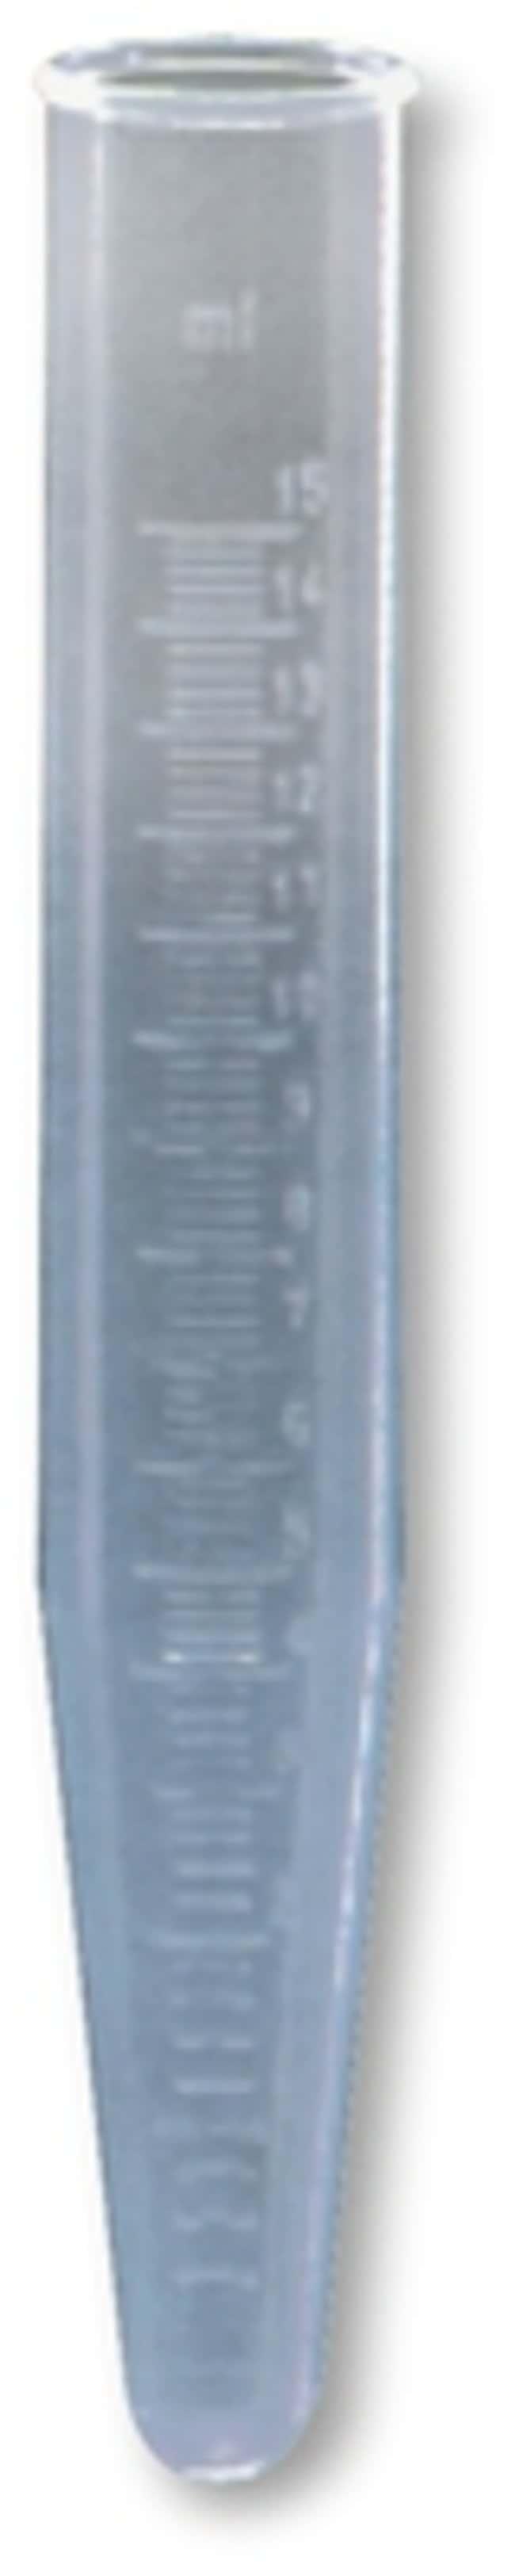 Kartell™Conical Centrifuge Tube Capacity Metric: 10mL Kartell™Conical Centrifuge Tube